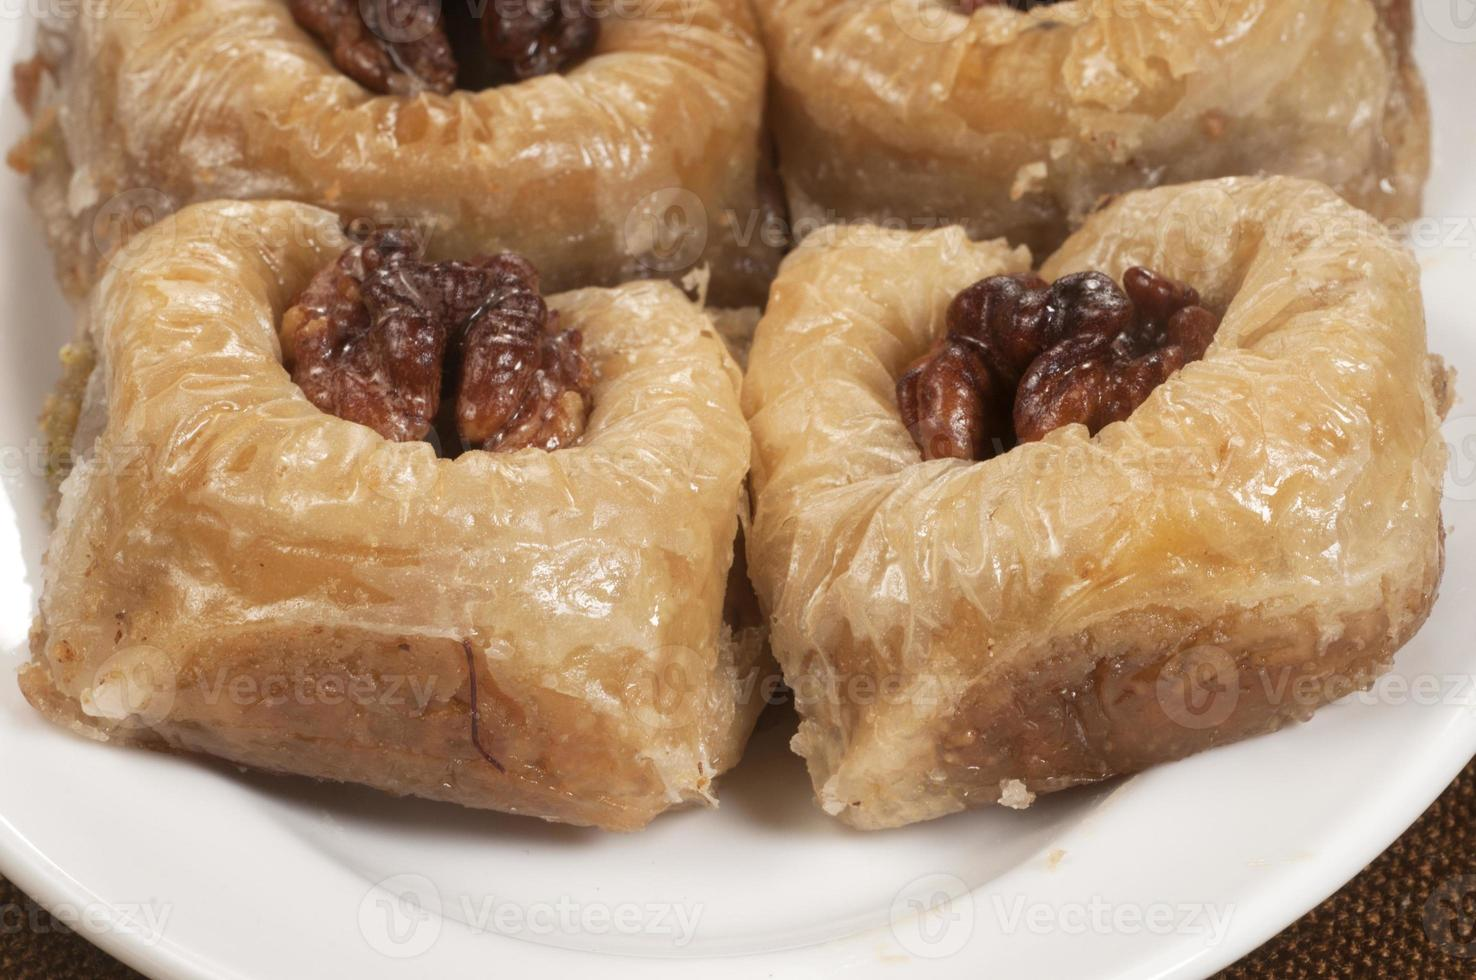 Baklava with walnut 'Sultan' photo